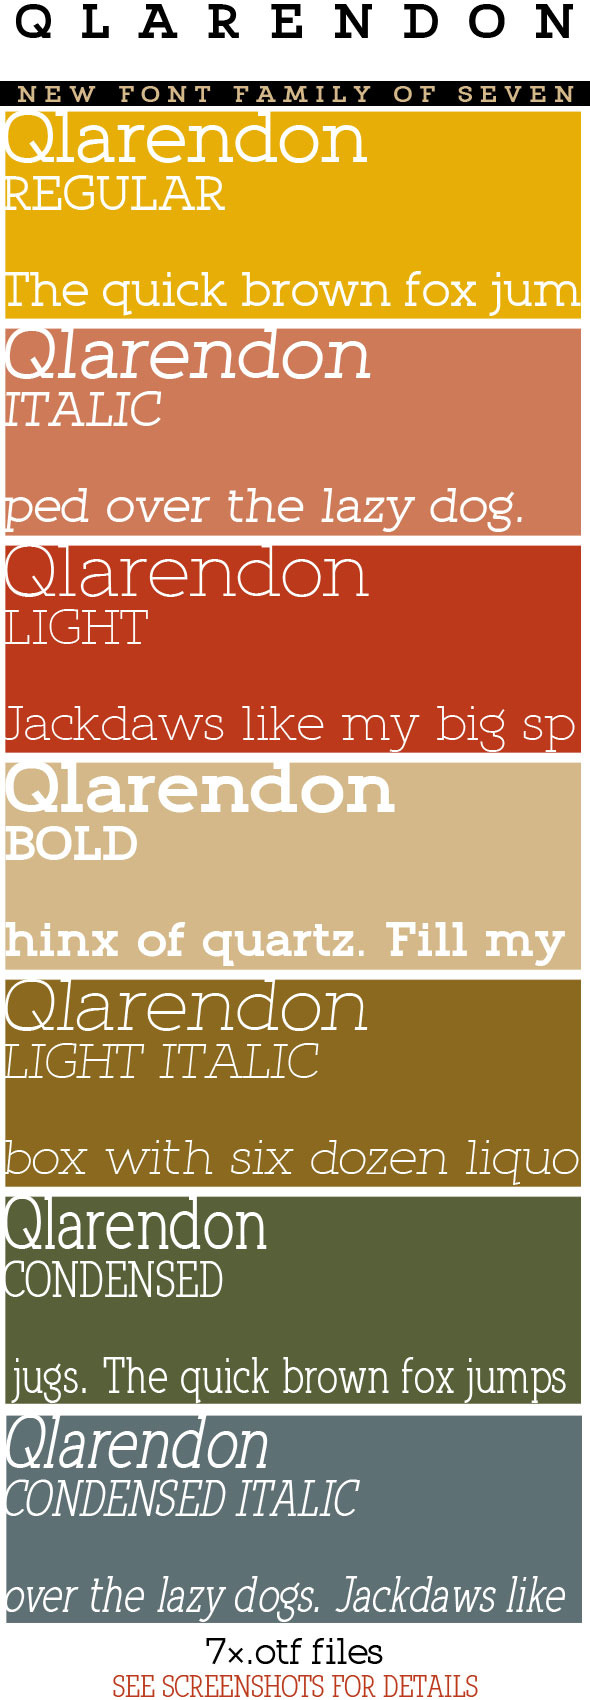 Qlarendon Font Family; Clean Modern Slab - Fonts